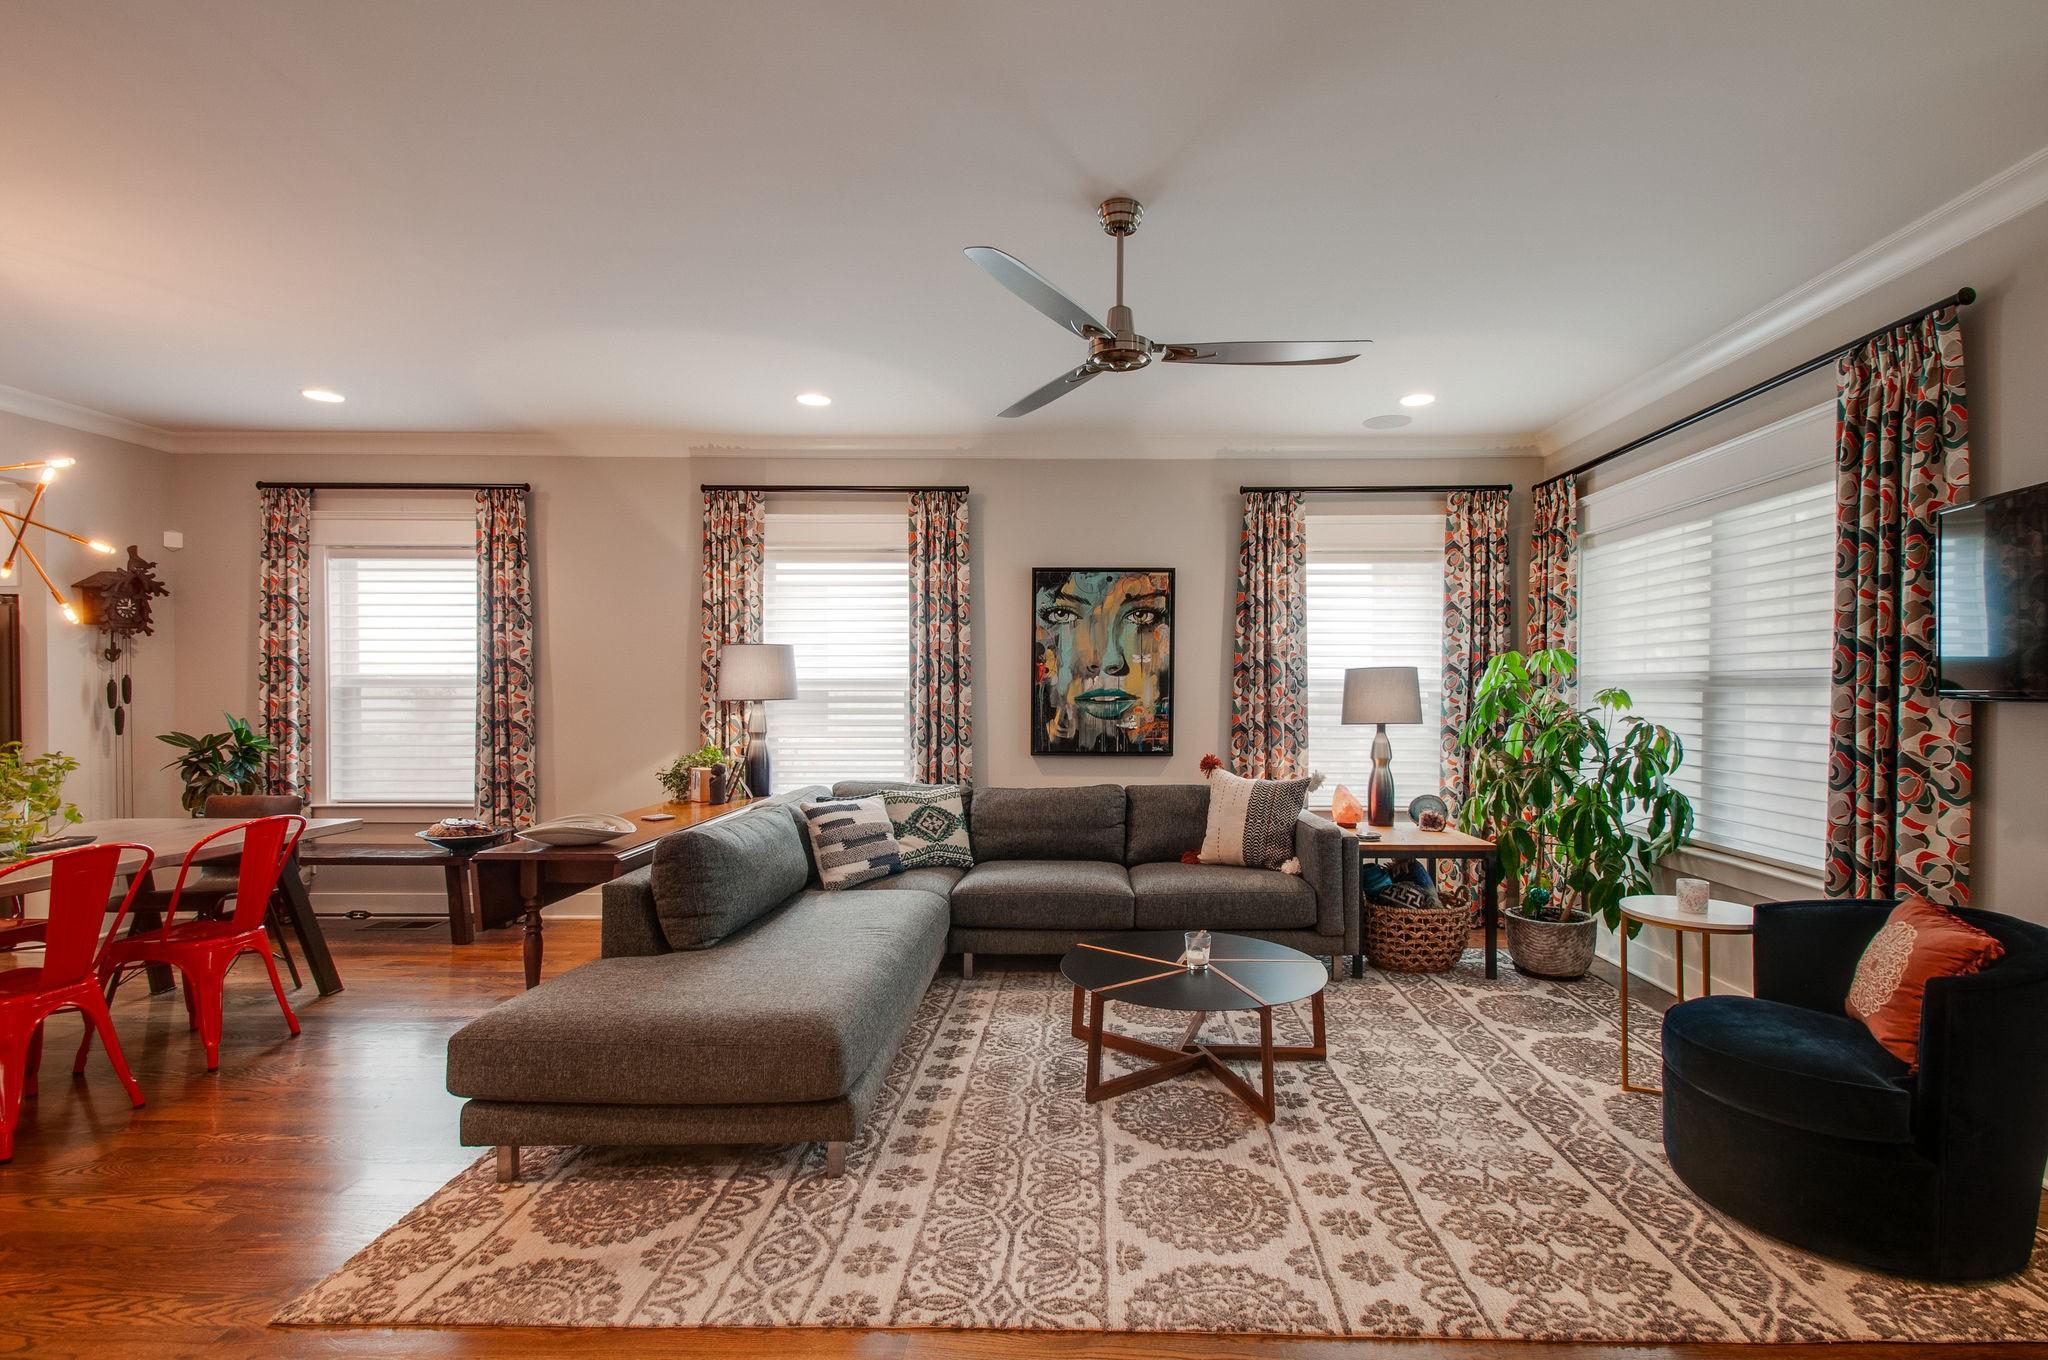 715 S 12th St, Nashville, TN 37206 - Nashville, TN real estate listing